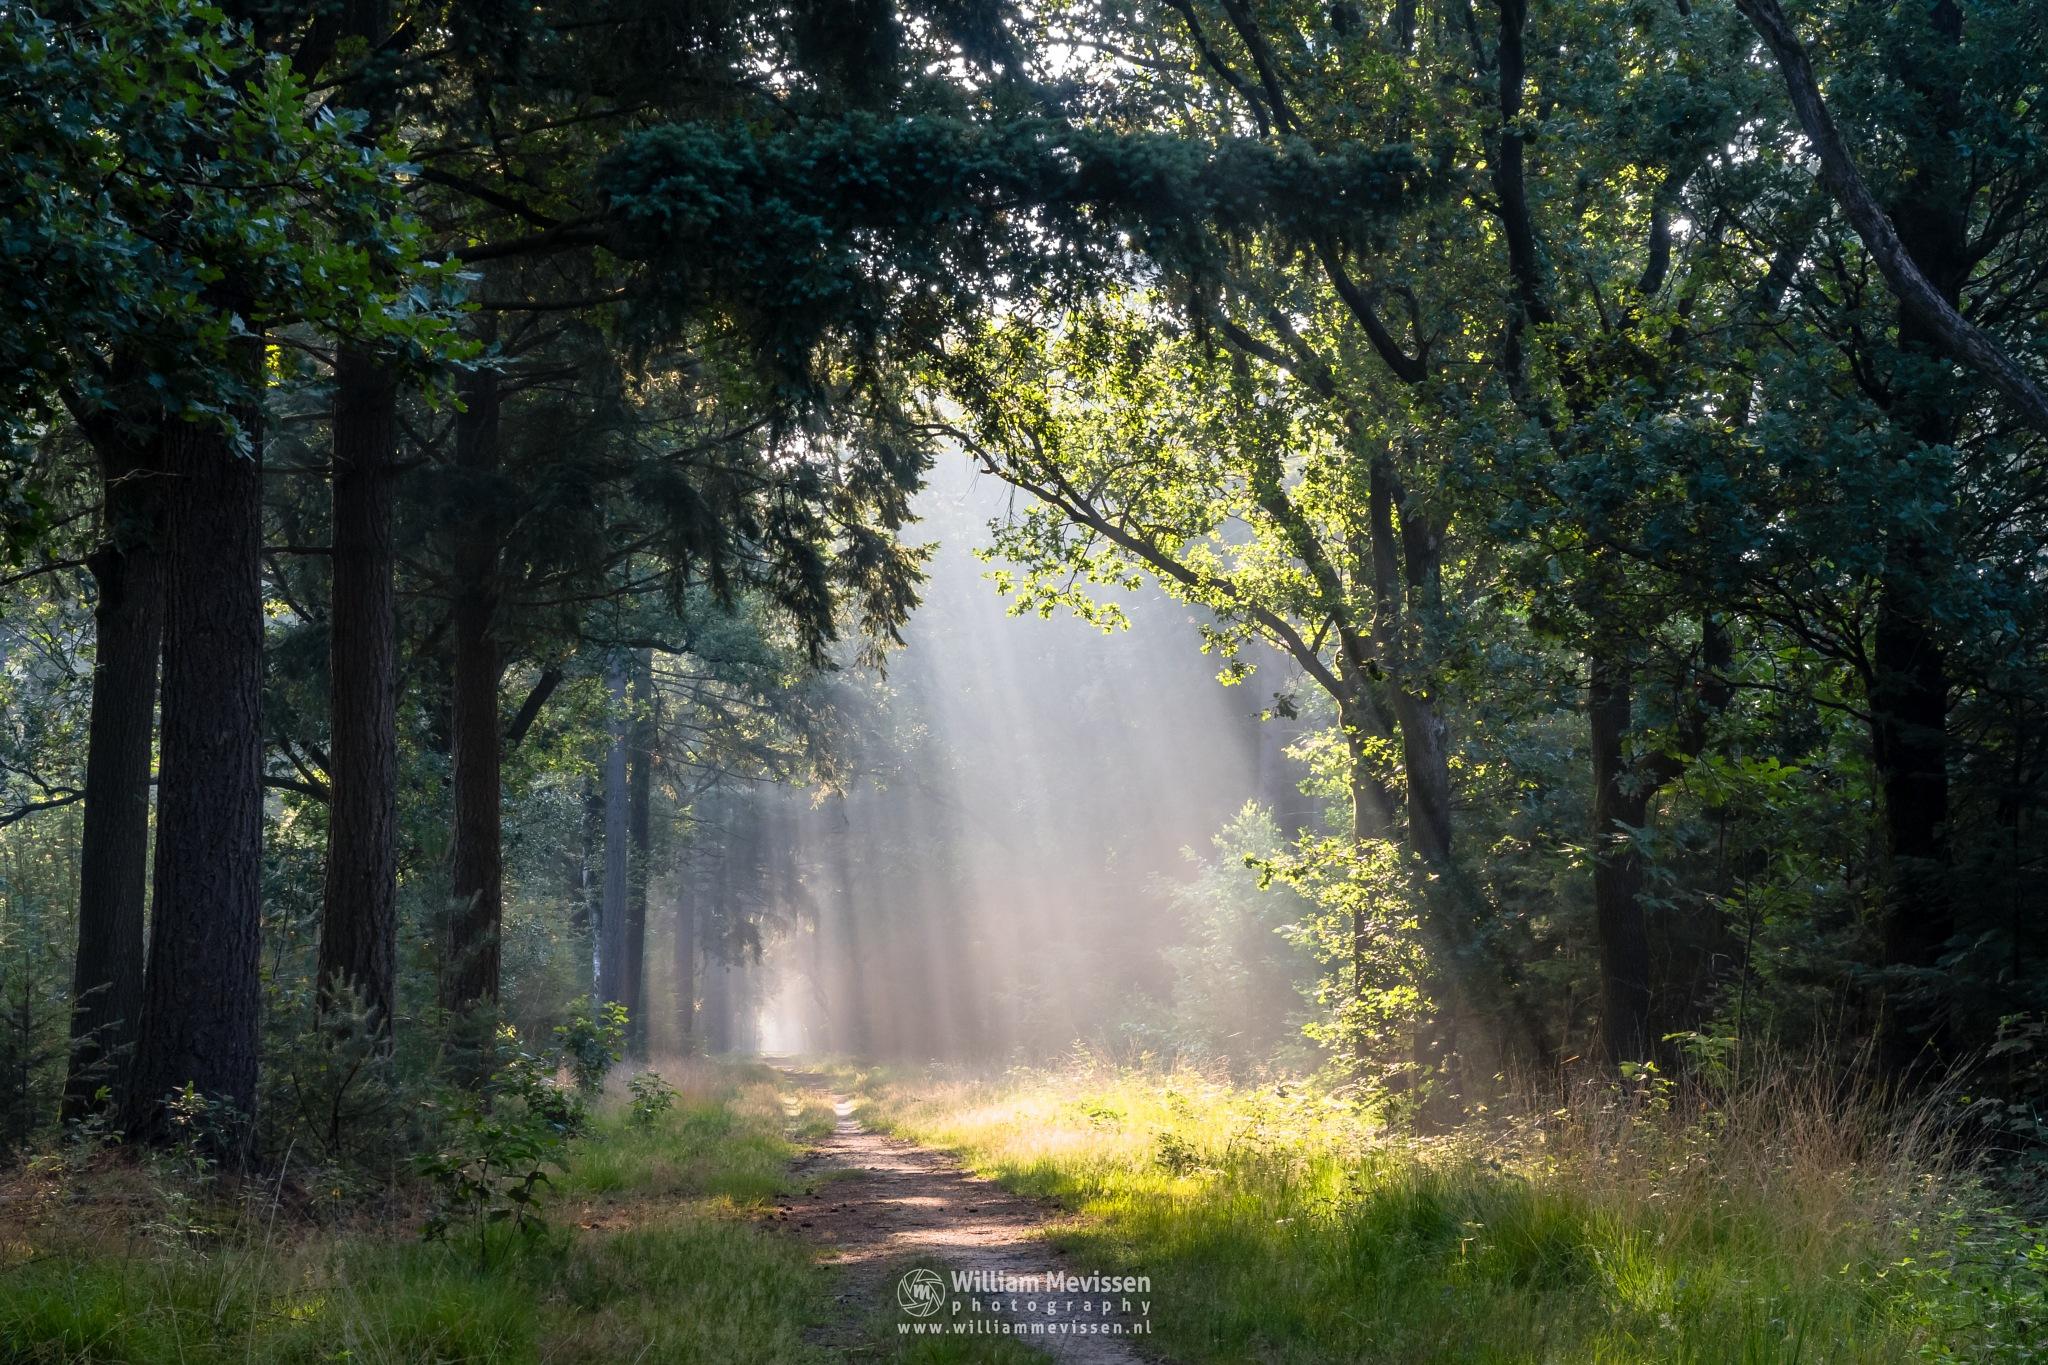 Raining Light by William Mevissen